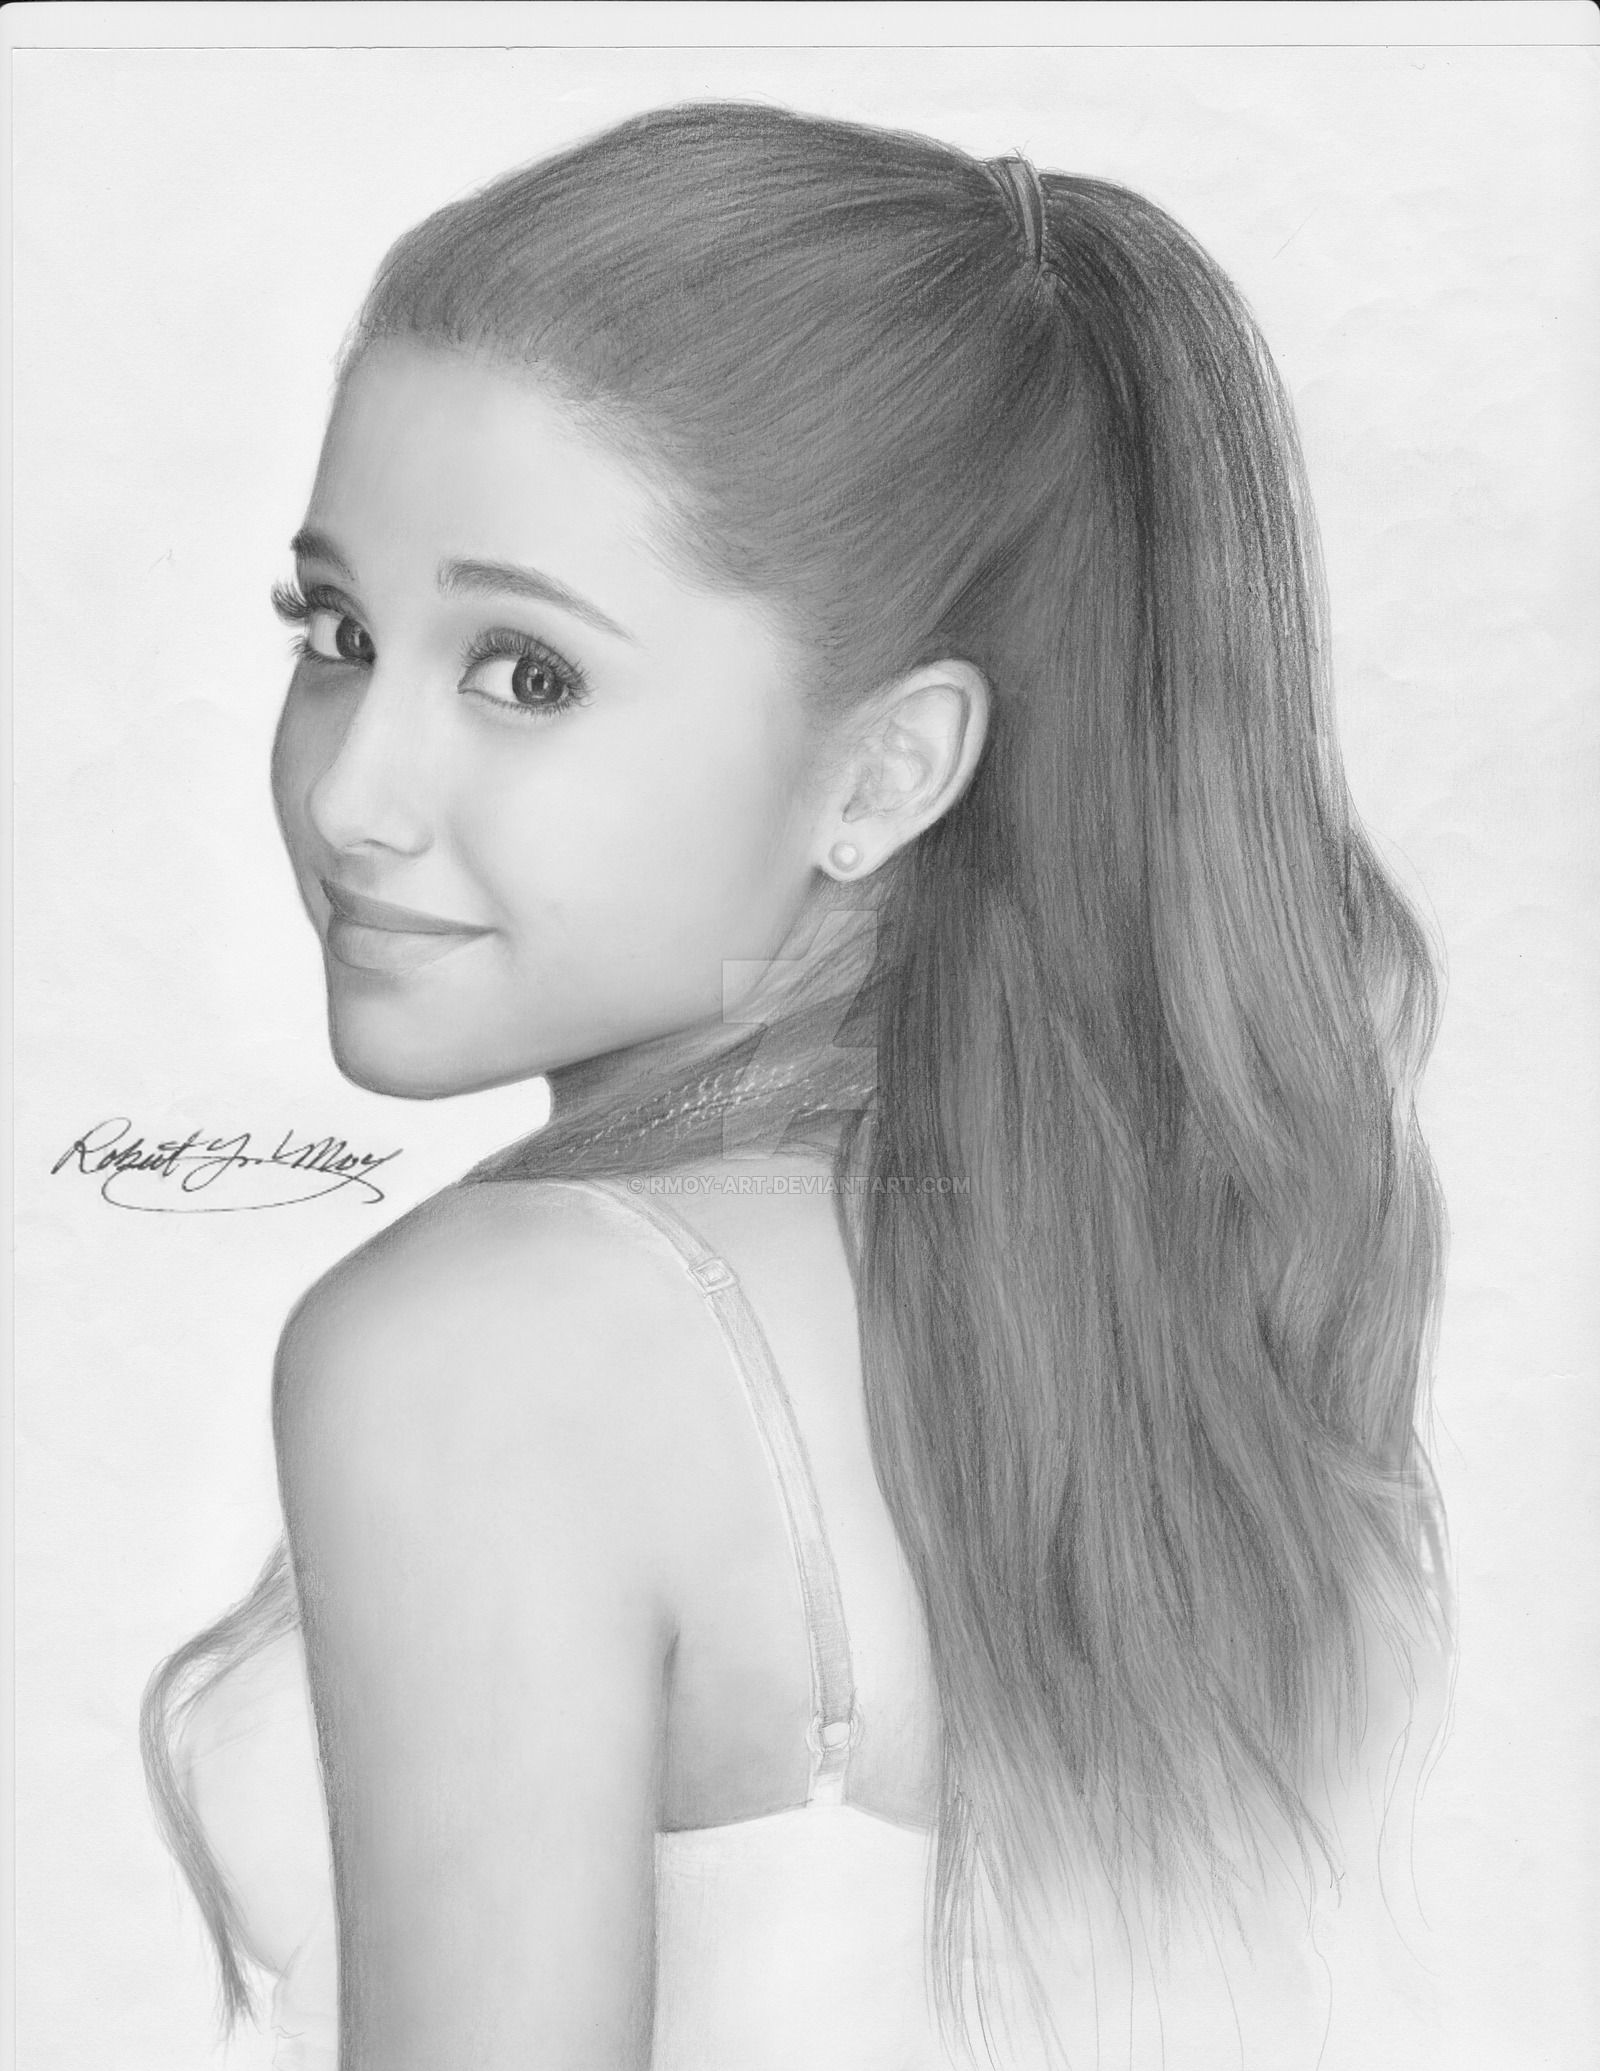 Ariana grande sketch